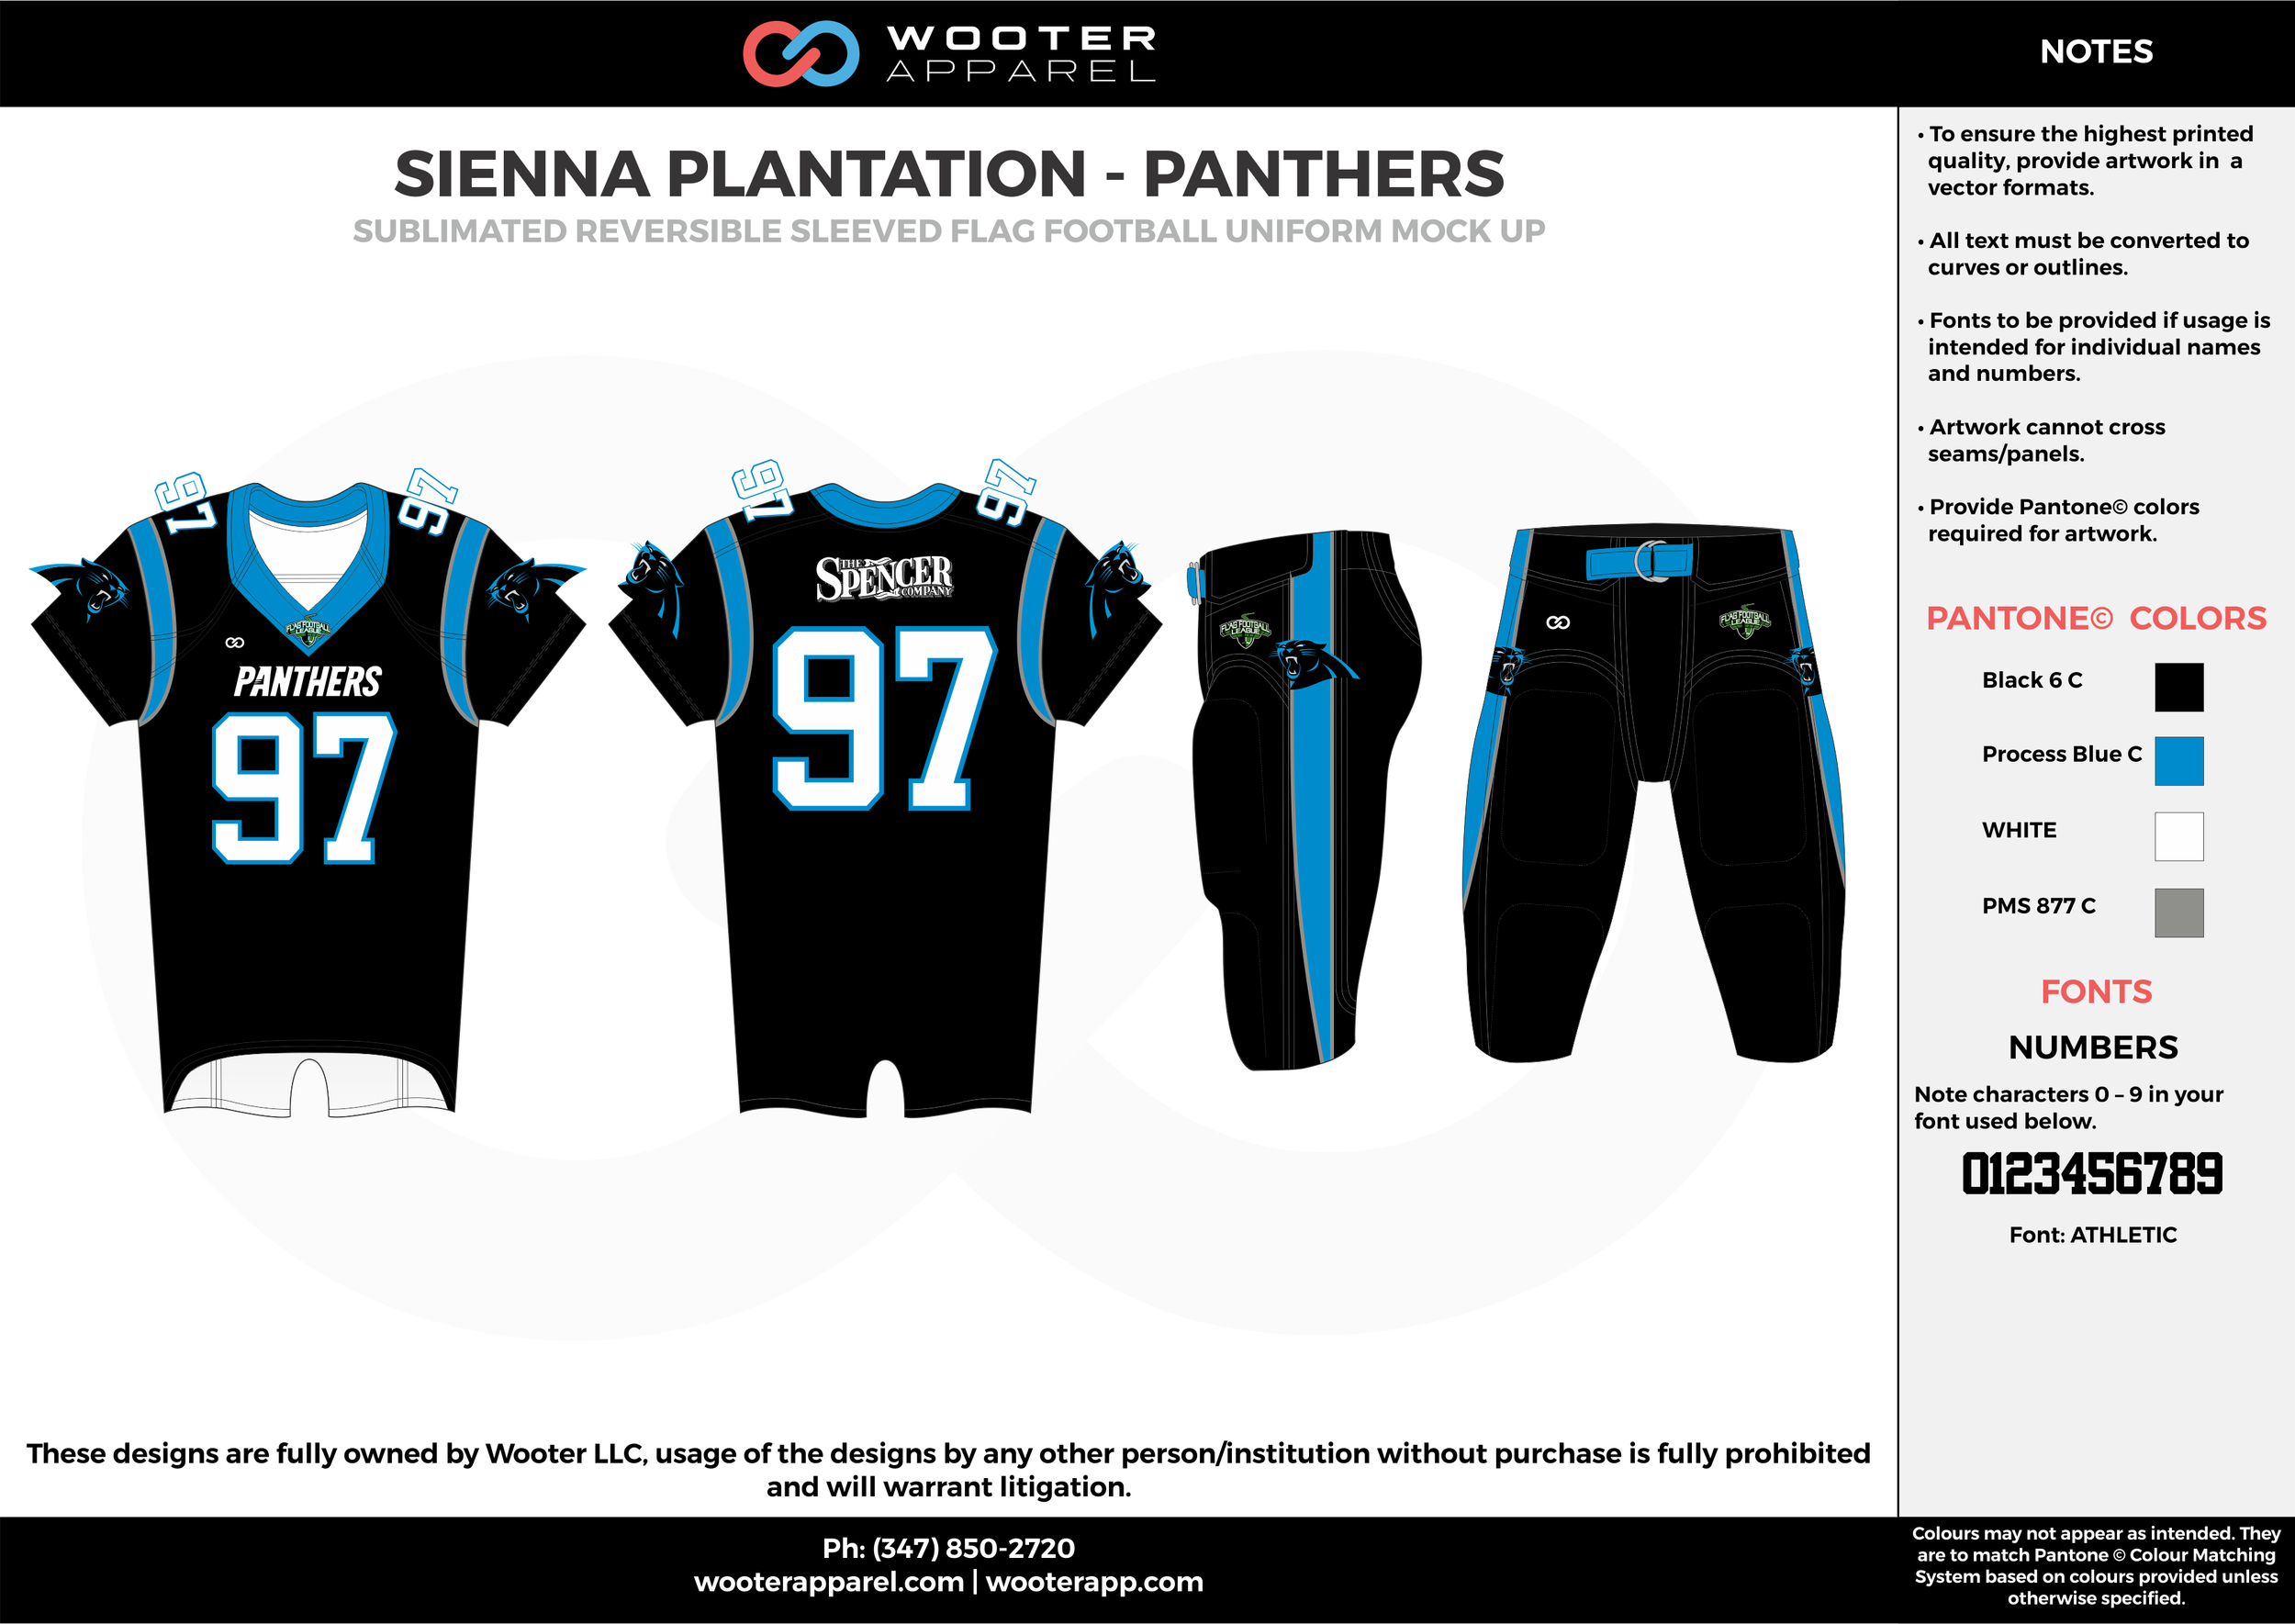 SIENNA PLANTATION - PANTHERS black blue gray white Football Uniform, Jersey, Pants, Integraded